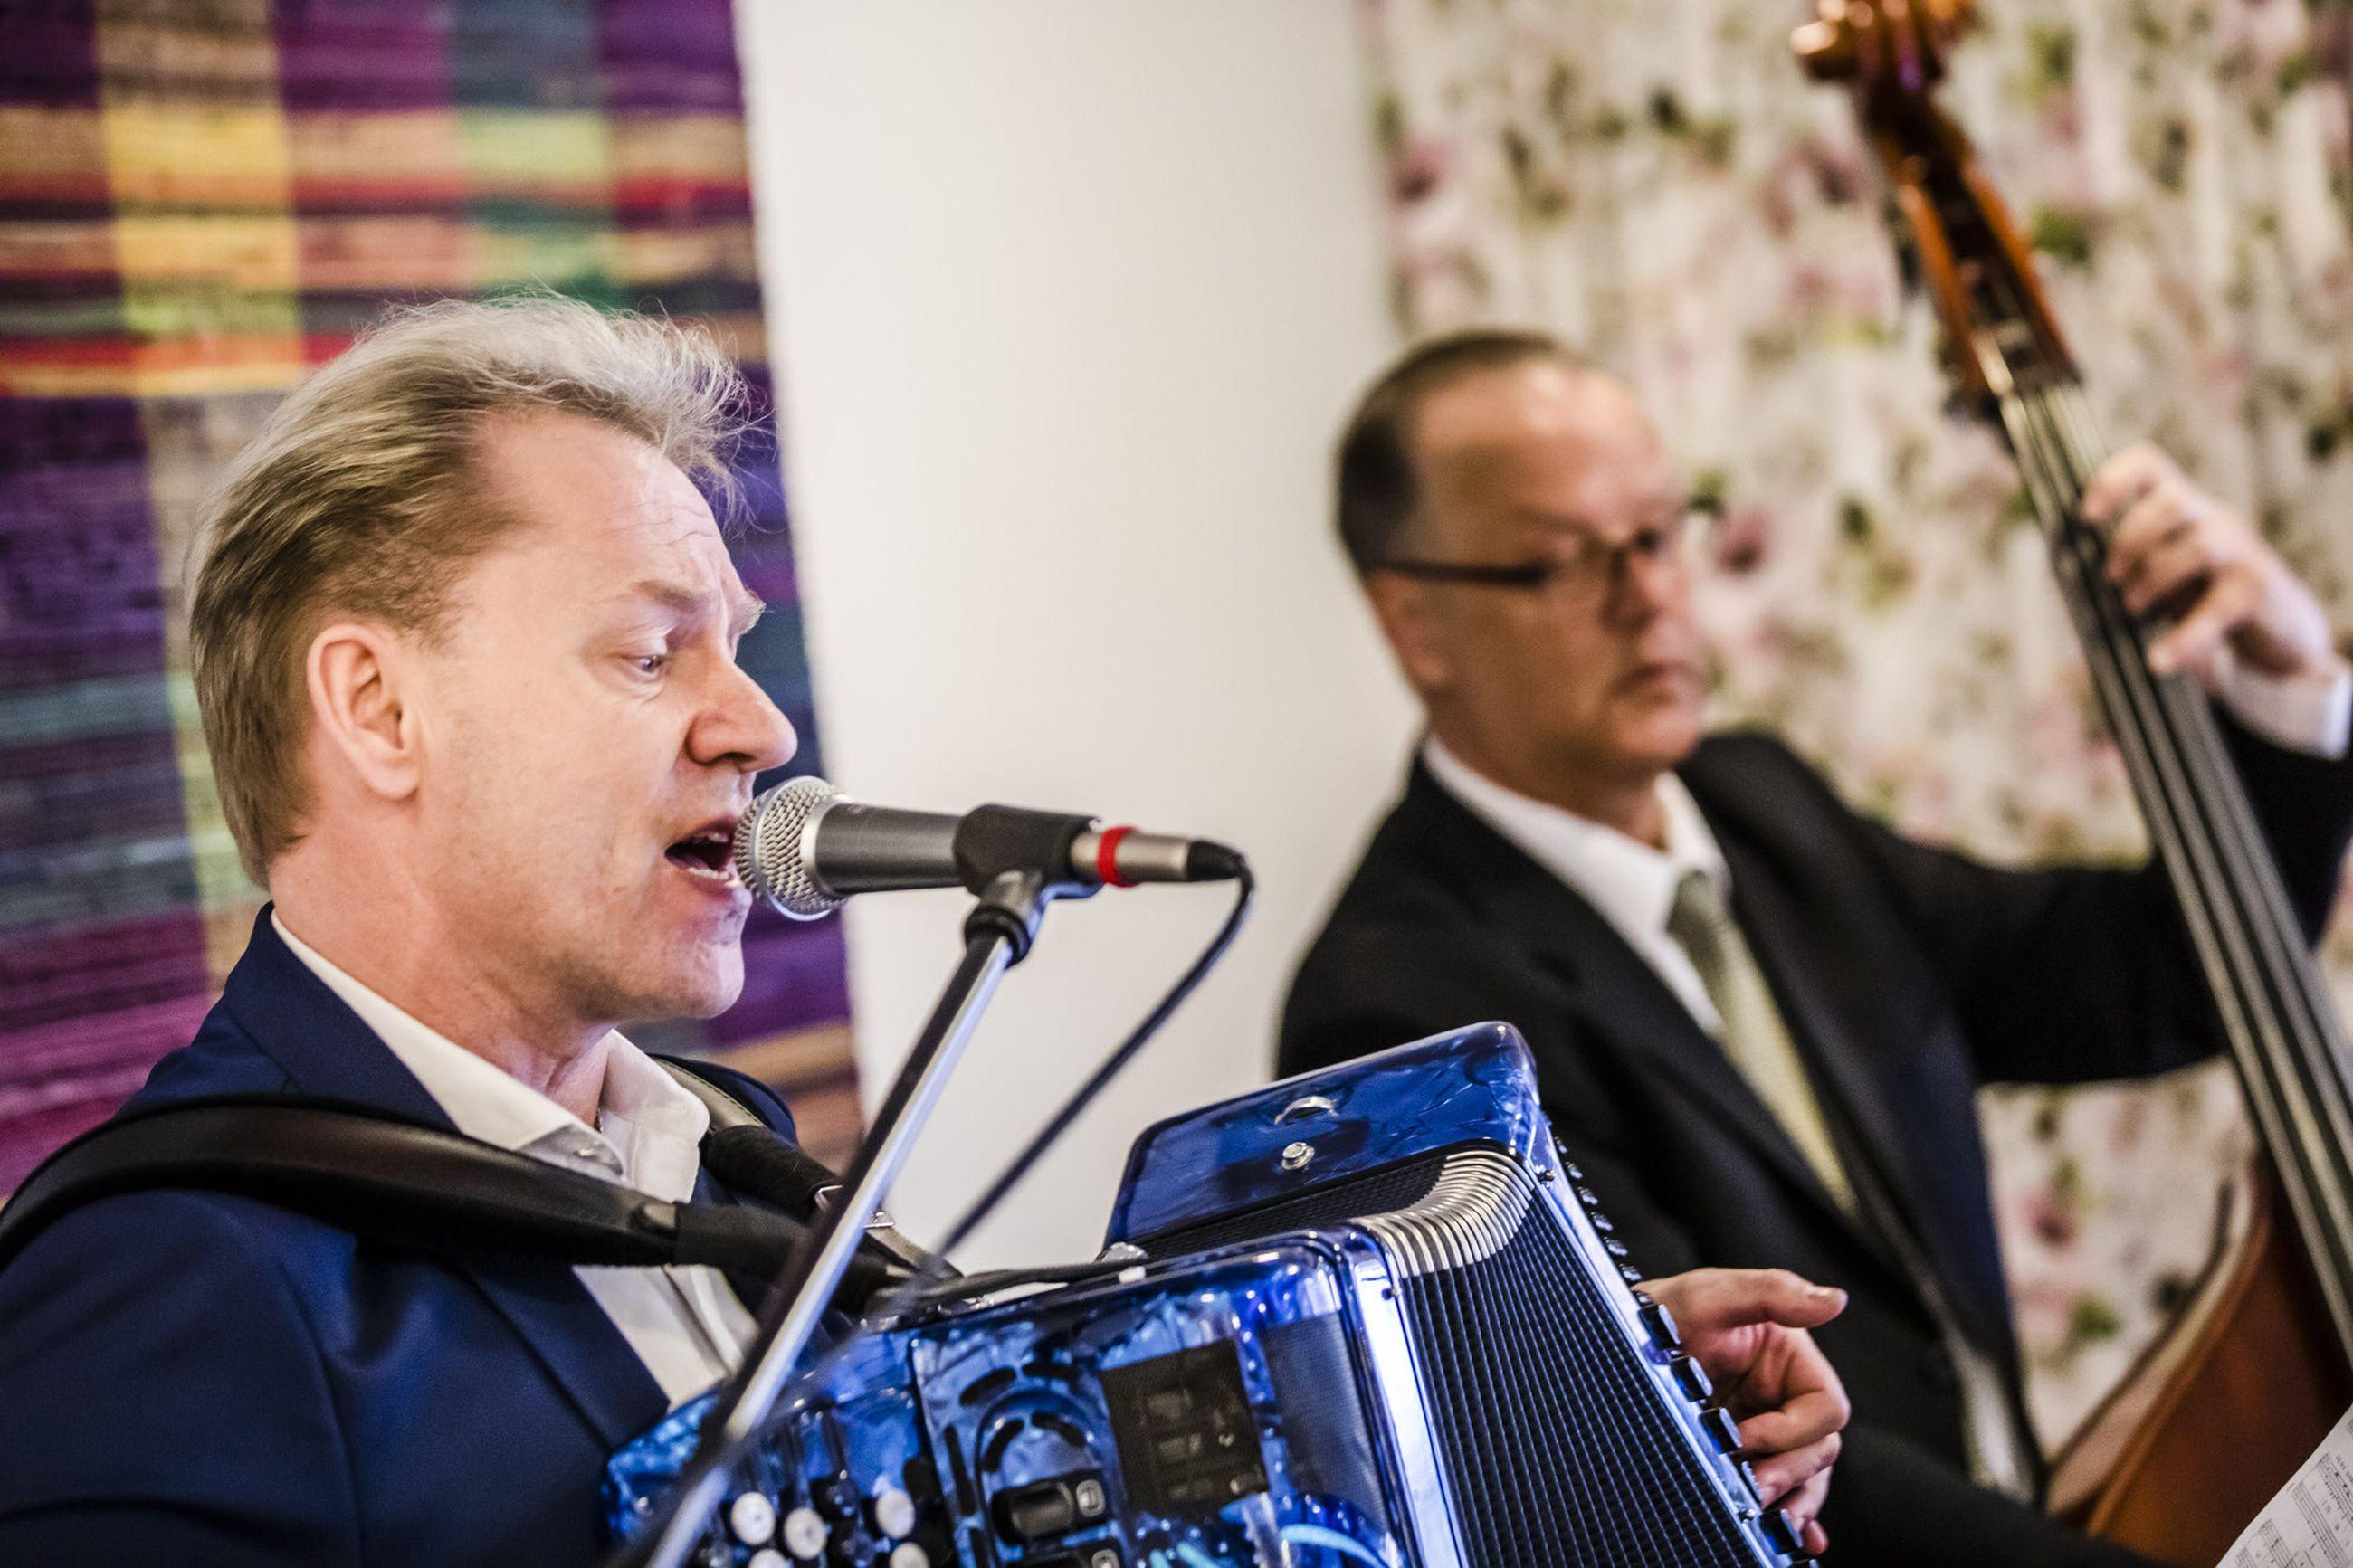 Jukka Paldanius